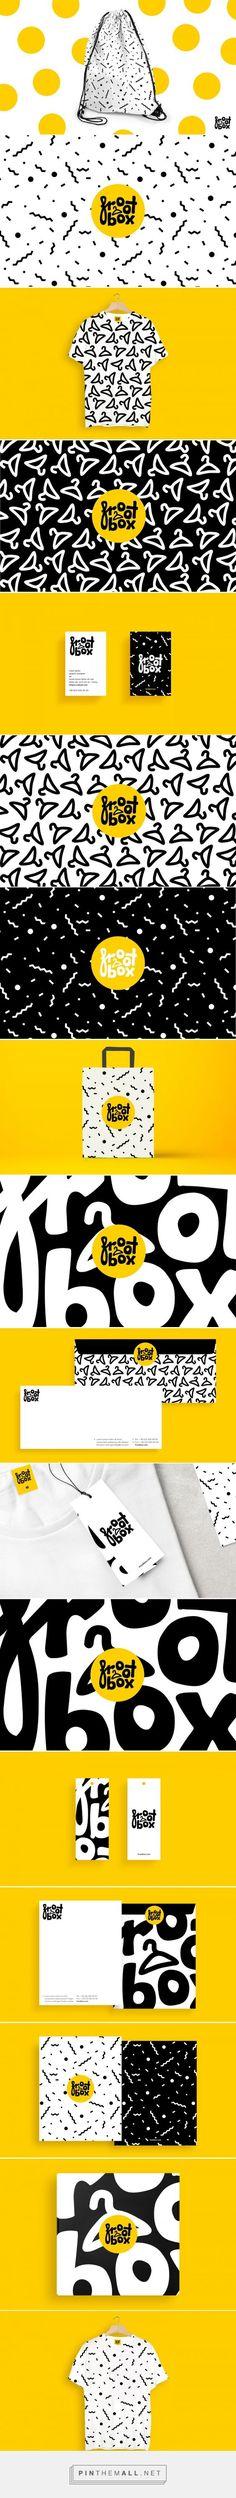 Frootbox Branding by Nuket Guner Corlan | Fivestar Branding – Design and Branding Agency & Inspiration Gallery: